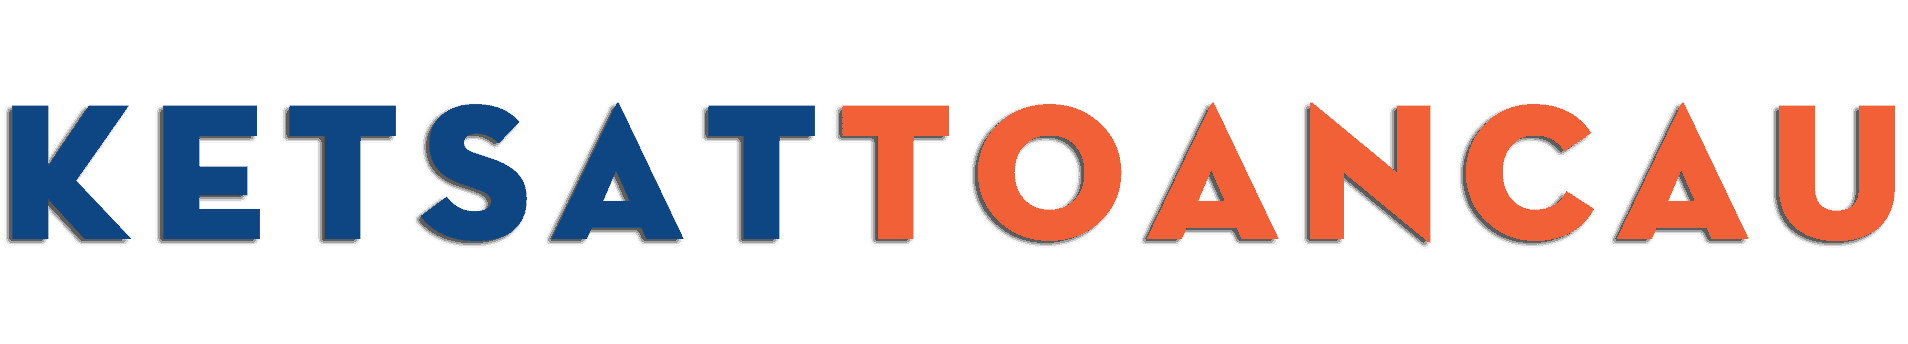 logo-ketsattoancau